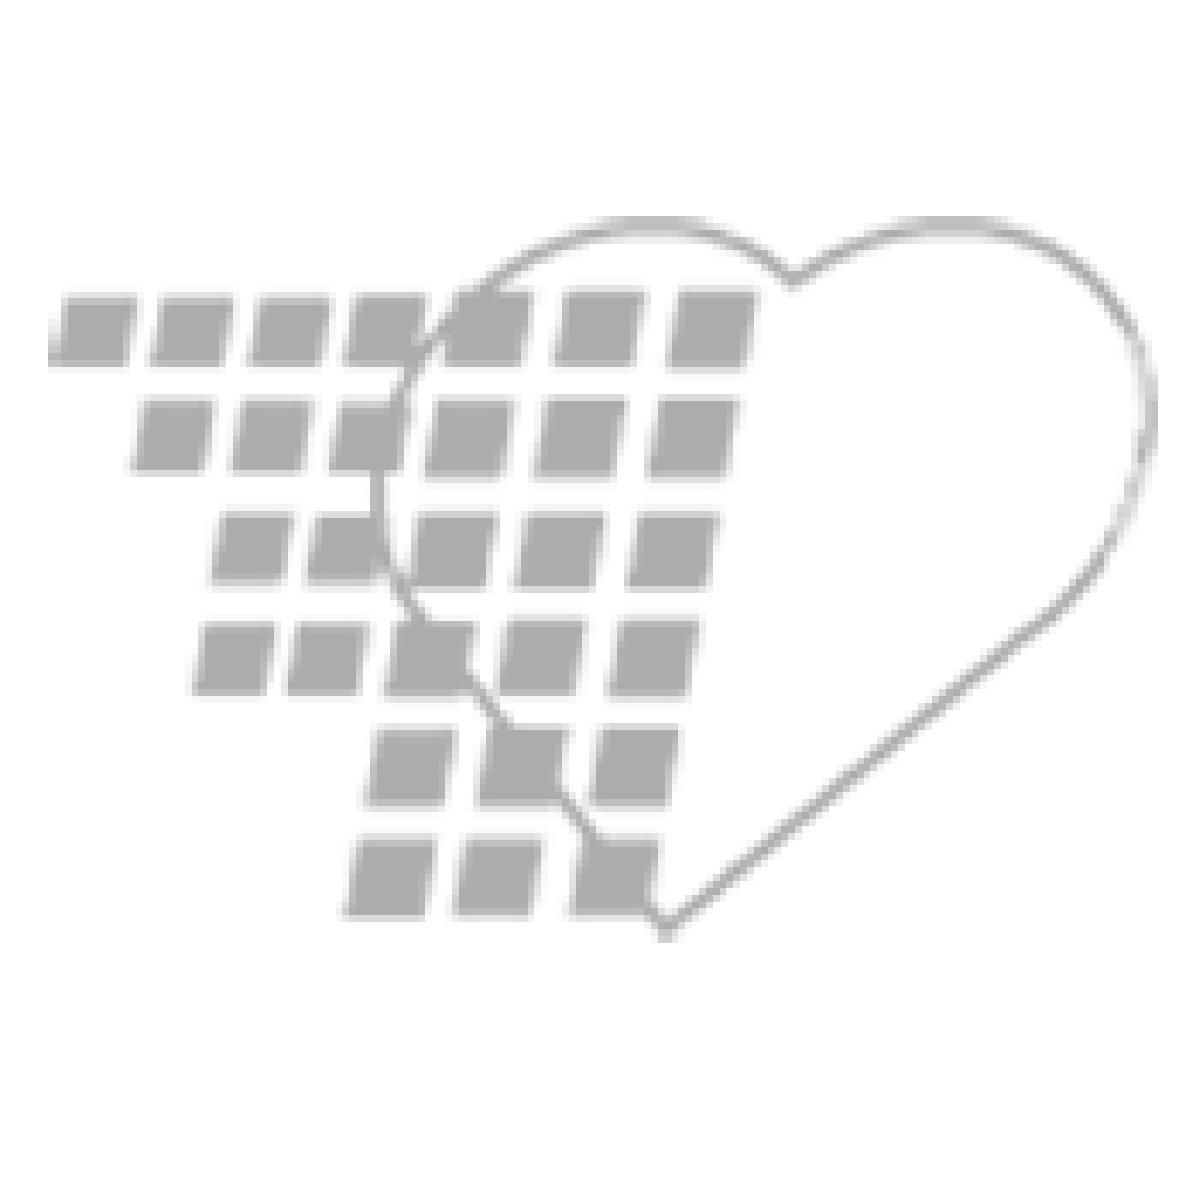 05-68-5511P Schuco®Inflatable Foot/Ankle Air Splints